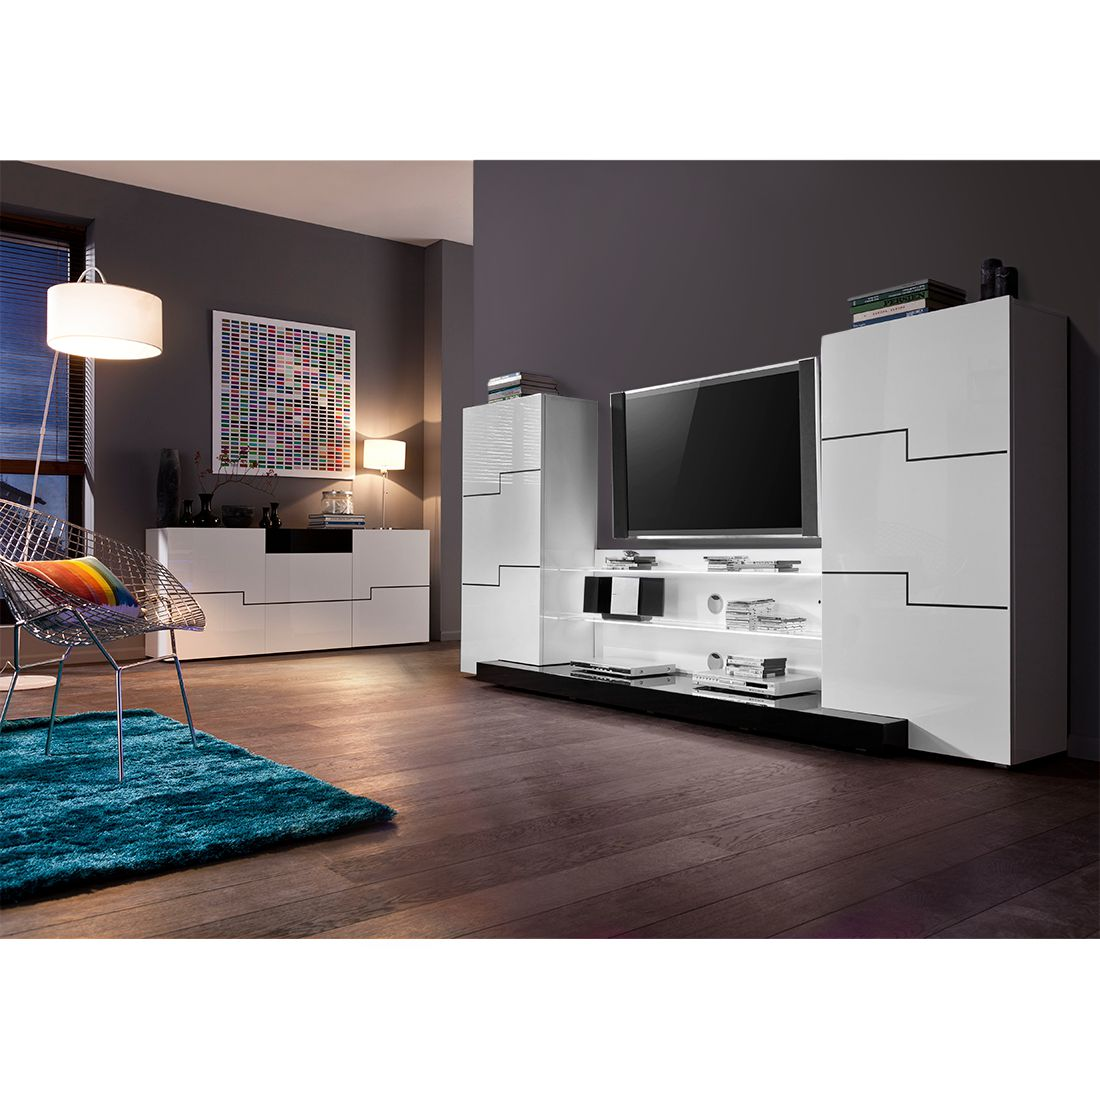 wohnwand twin hochglanz wei mit beleuchtung ohne wandboard roomscape. Black Bedroom Furniture Sets. Home Design Ideas